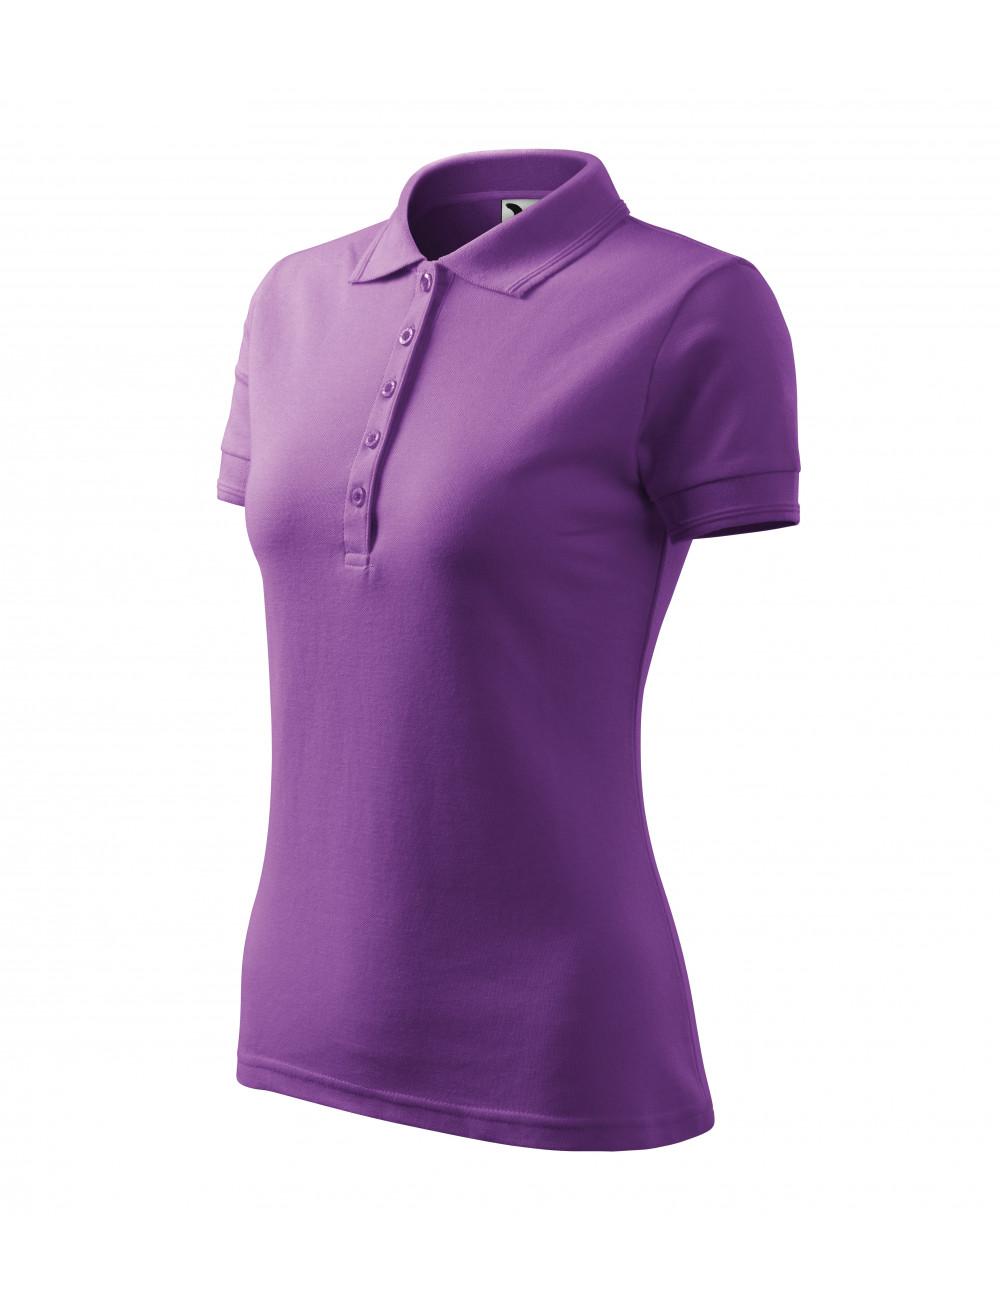 Adler MALFINI Koszulka polo damska Pique Polo 210 fioletowy